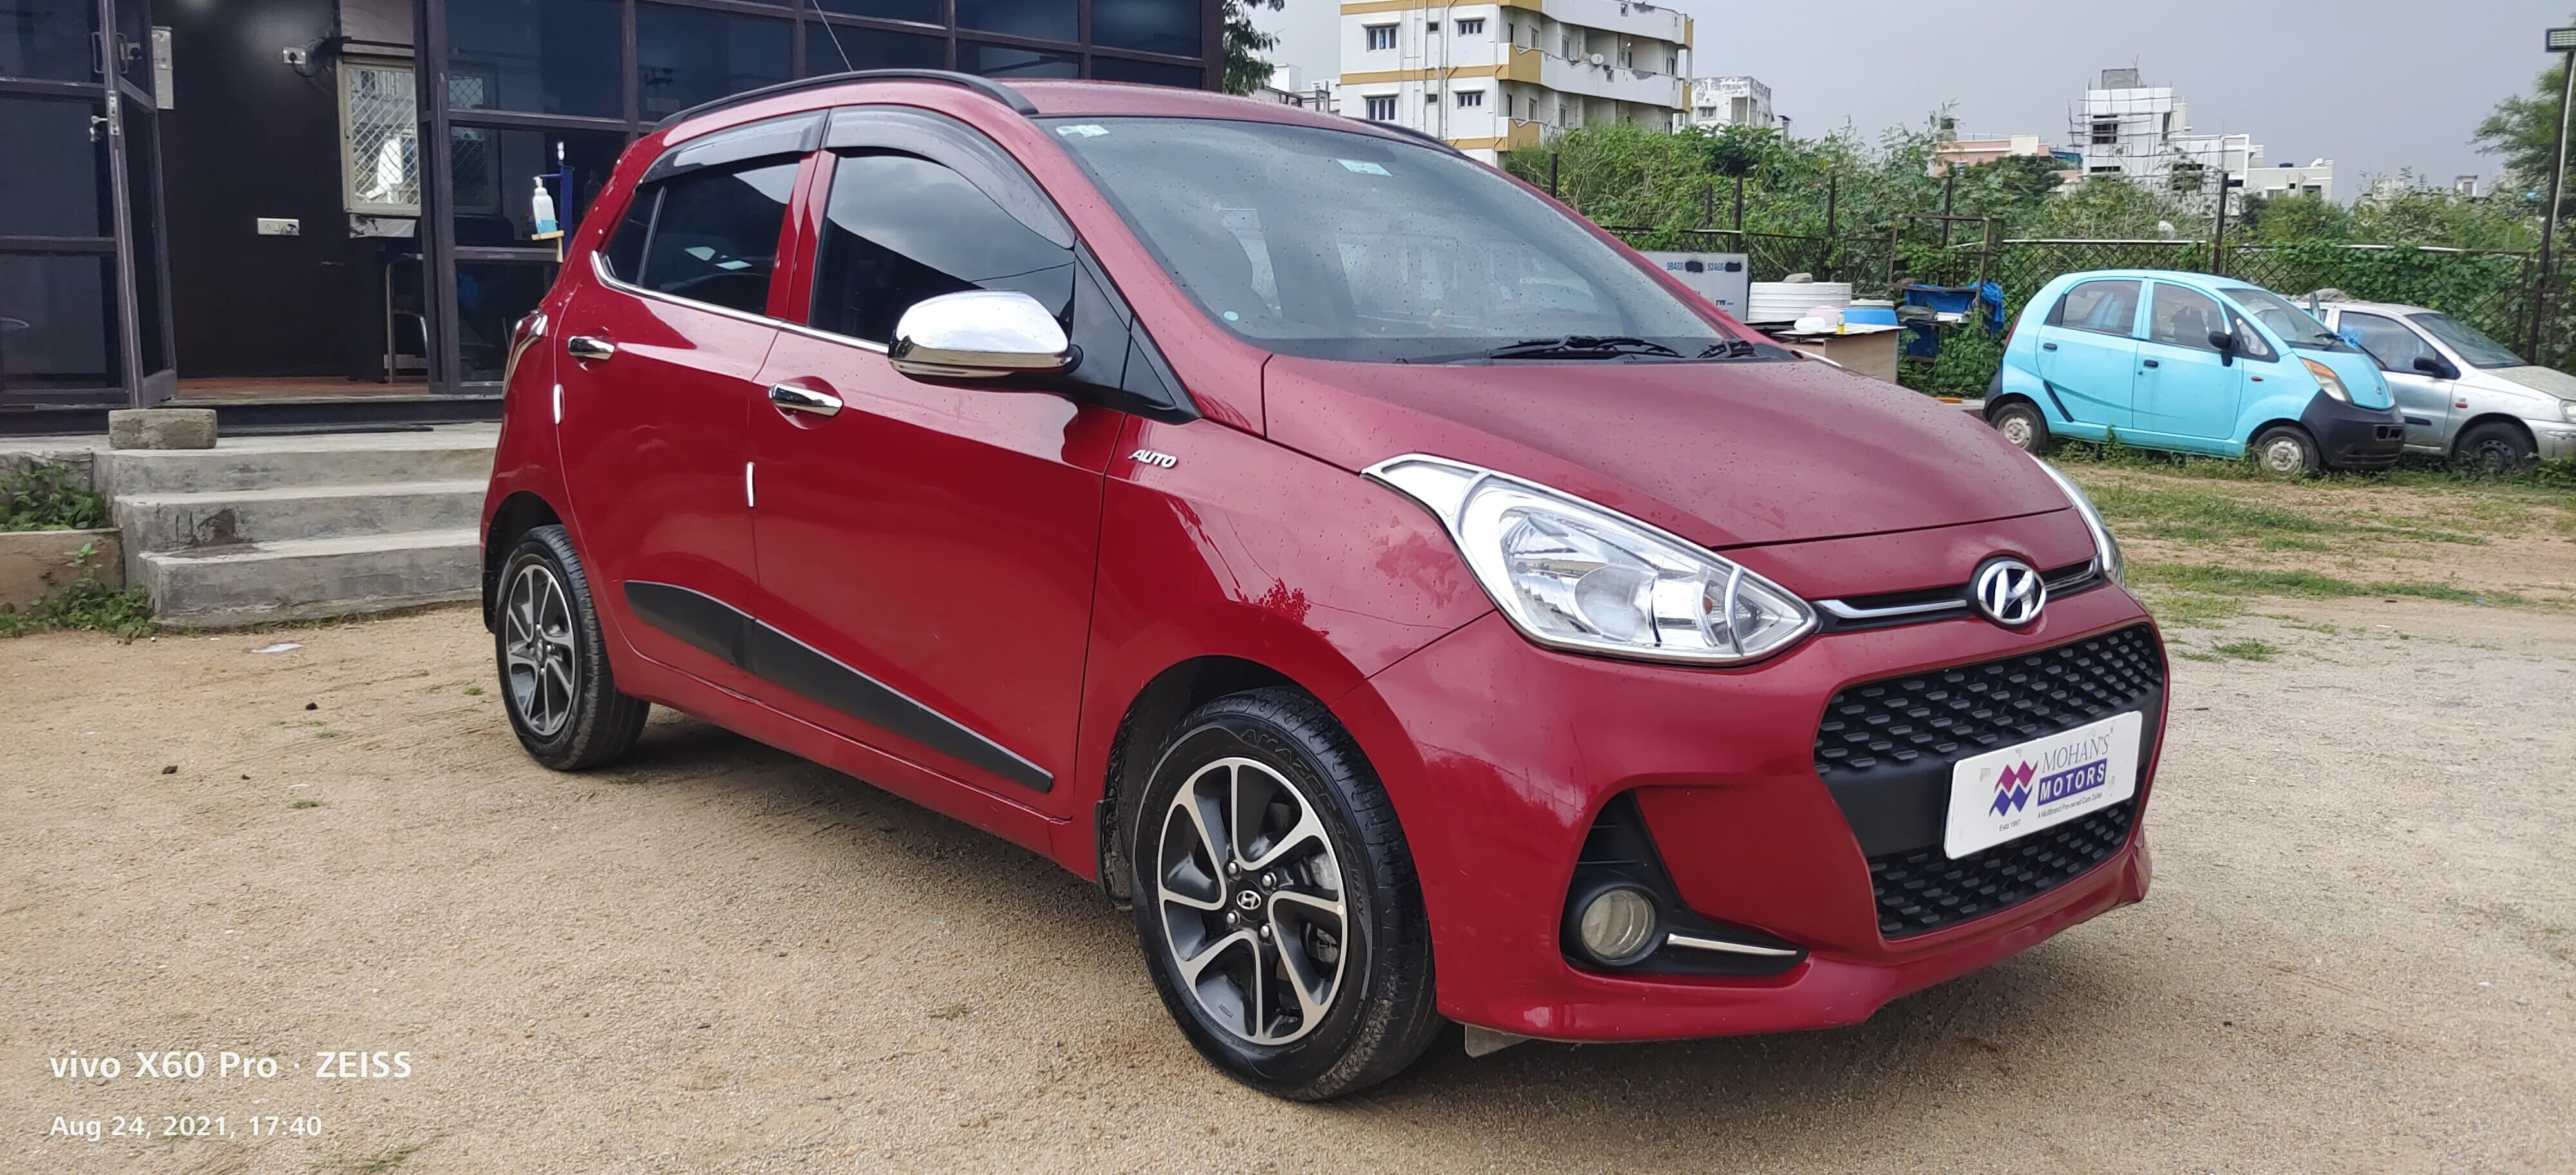 Hyundai Grand i10 1.2 Kappa Sportz Option AT